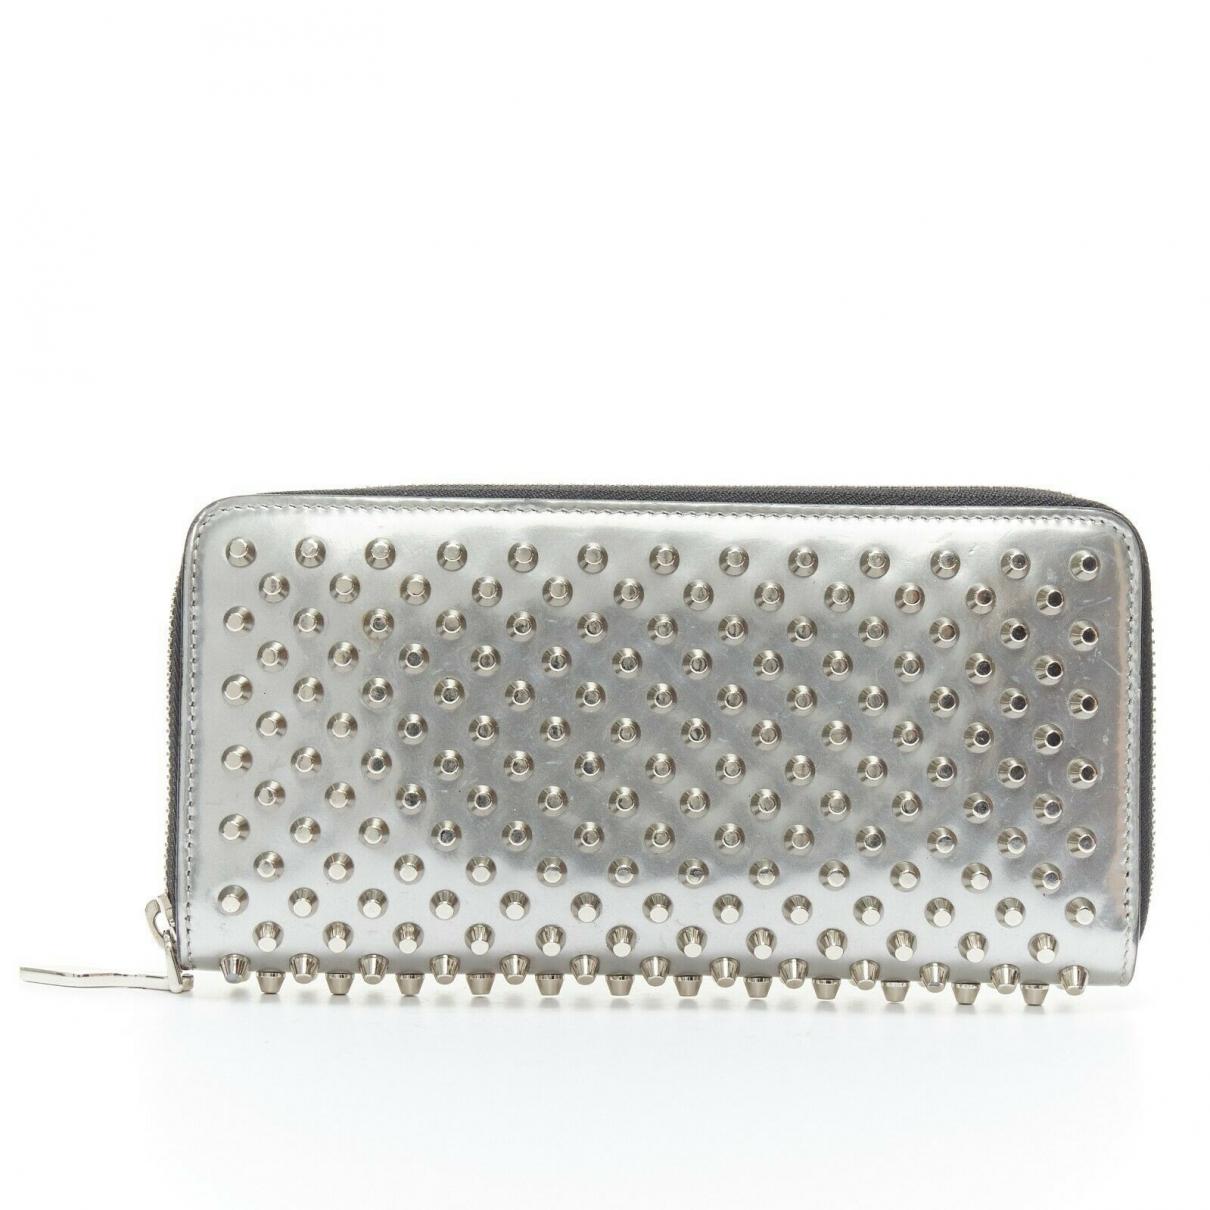 Christian Louboutin Panettone Metallic Leather wallet for Women \N